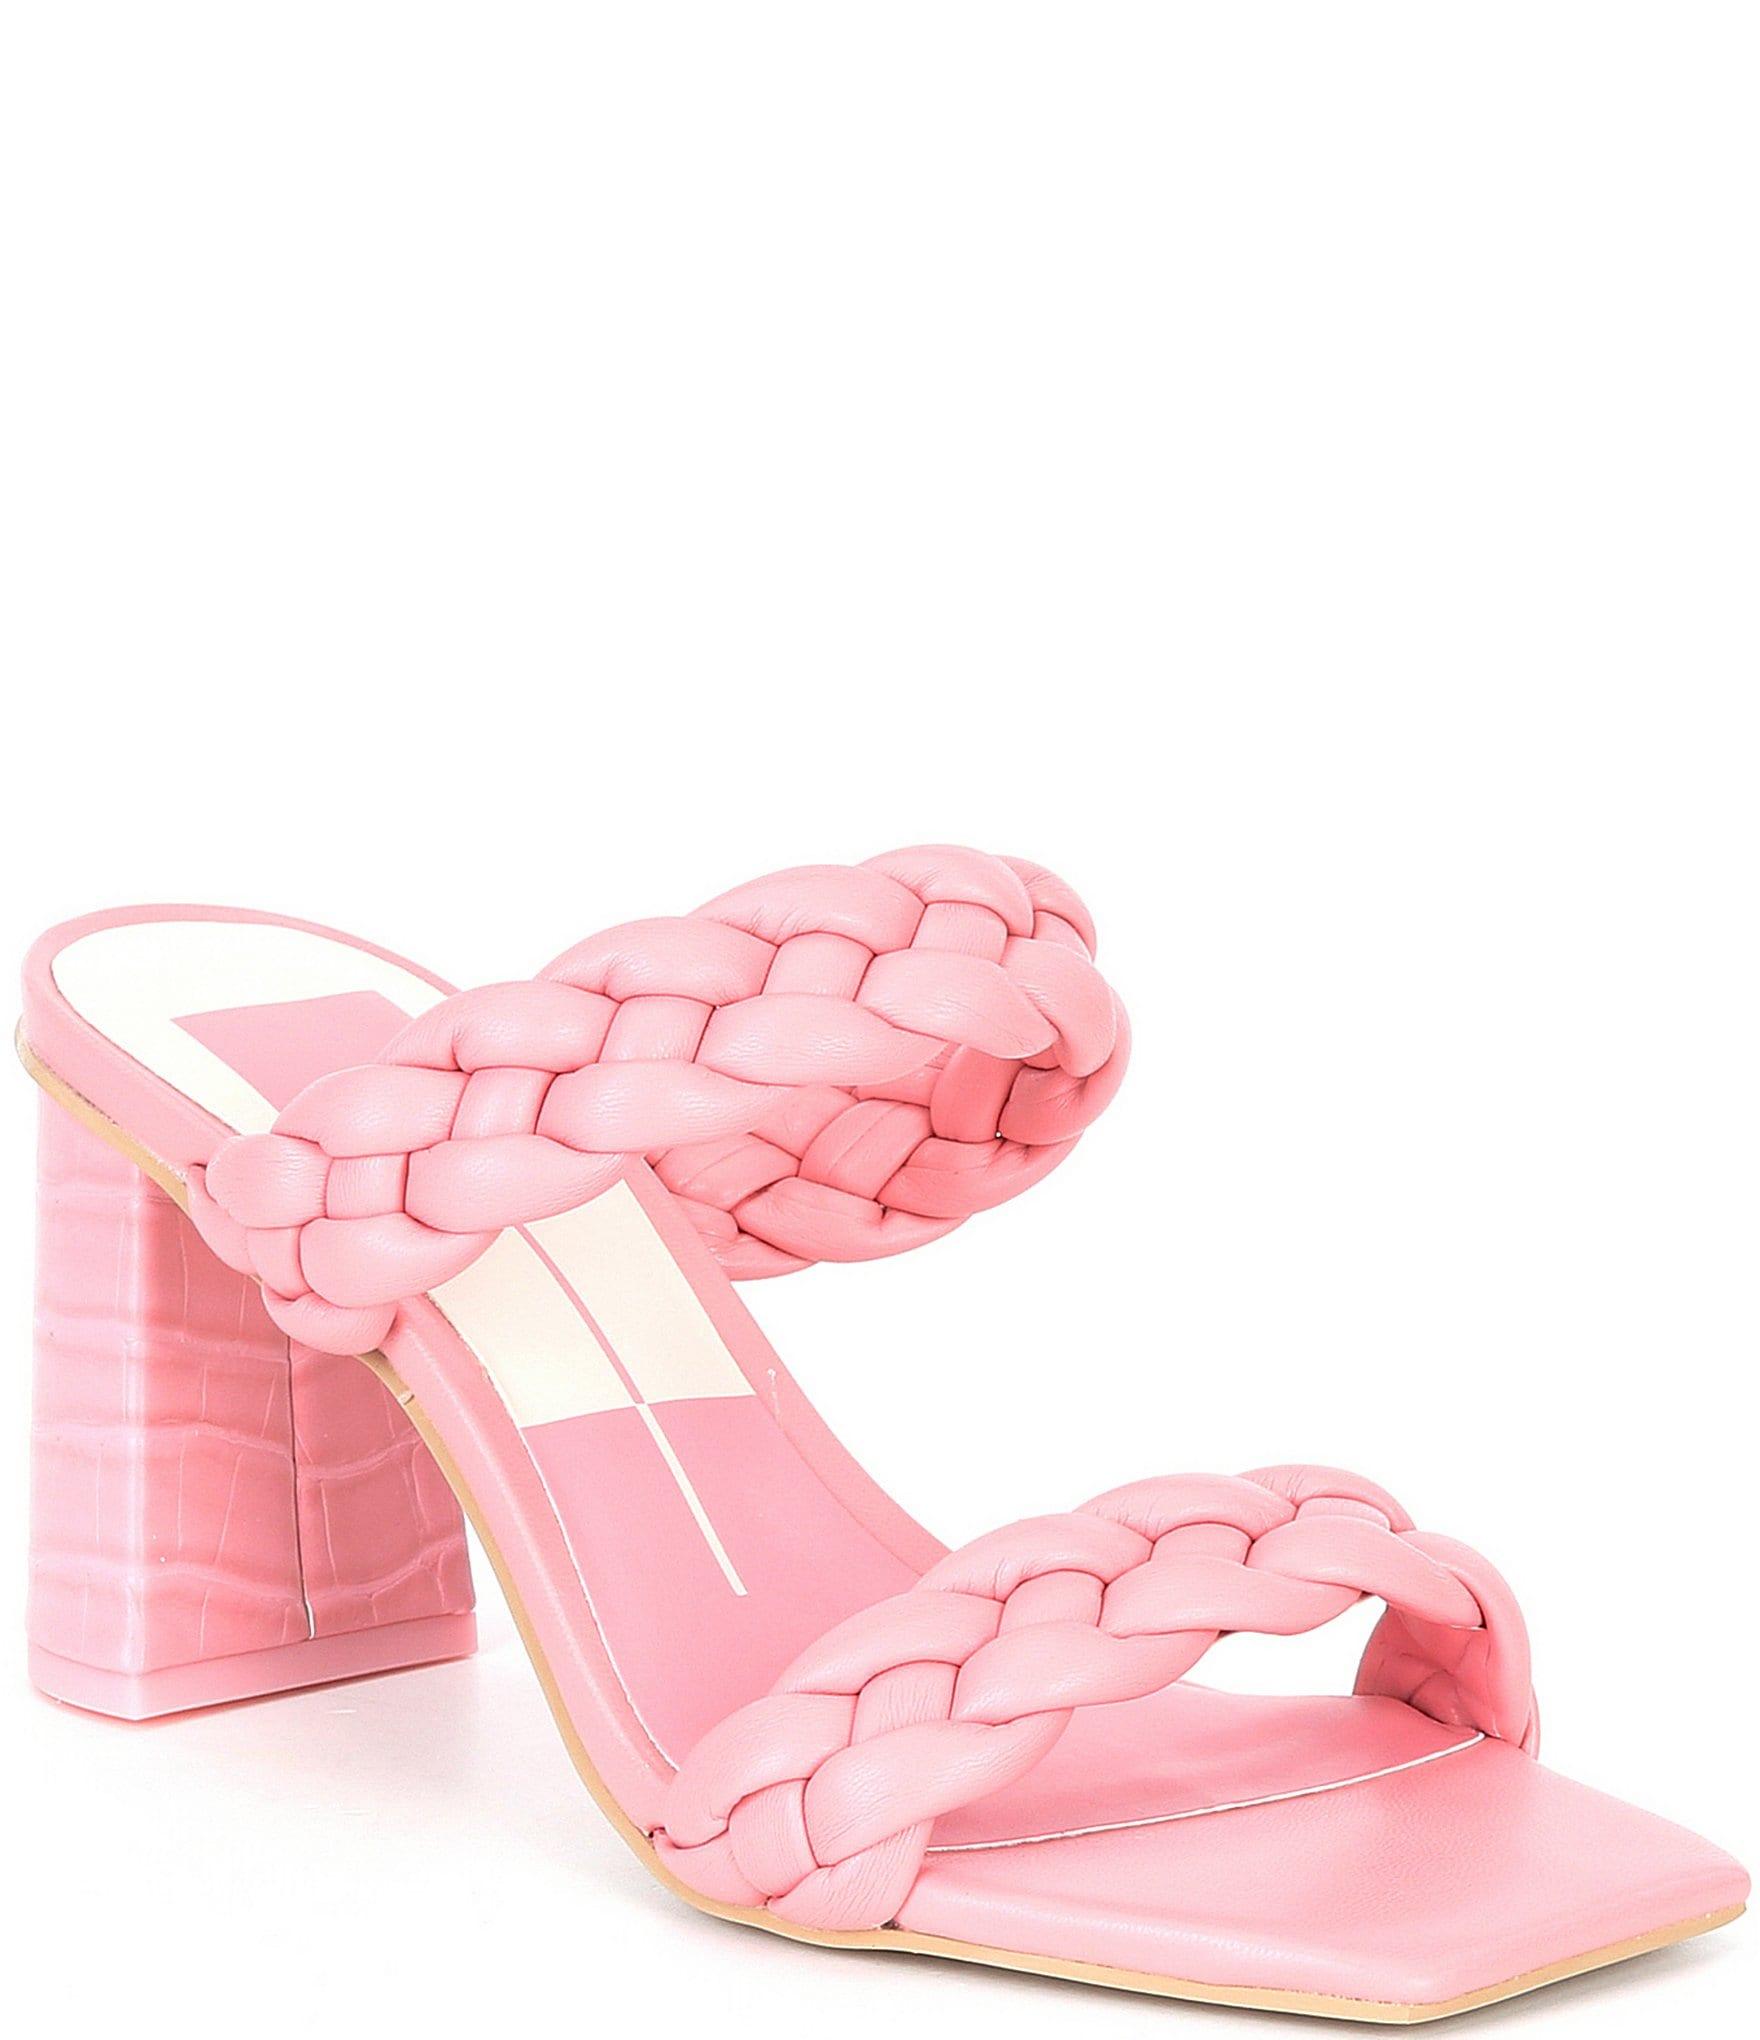 MON AMOUR Baby Pink Mesh Slip Dress and Thong Set